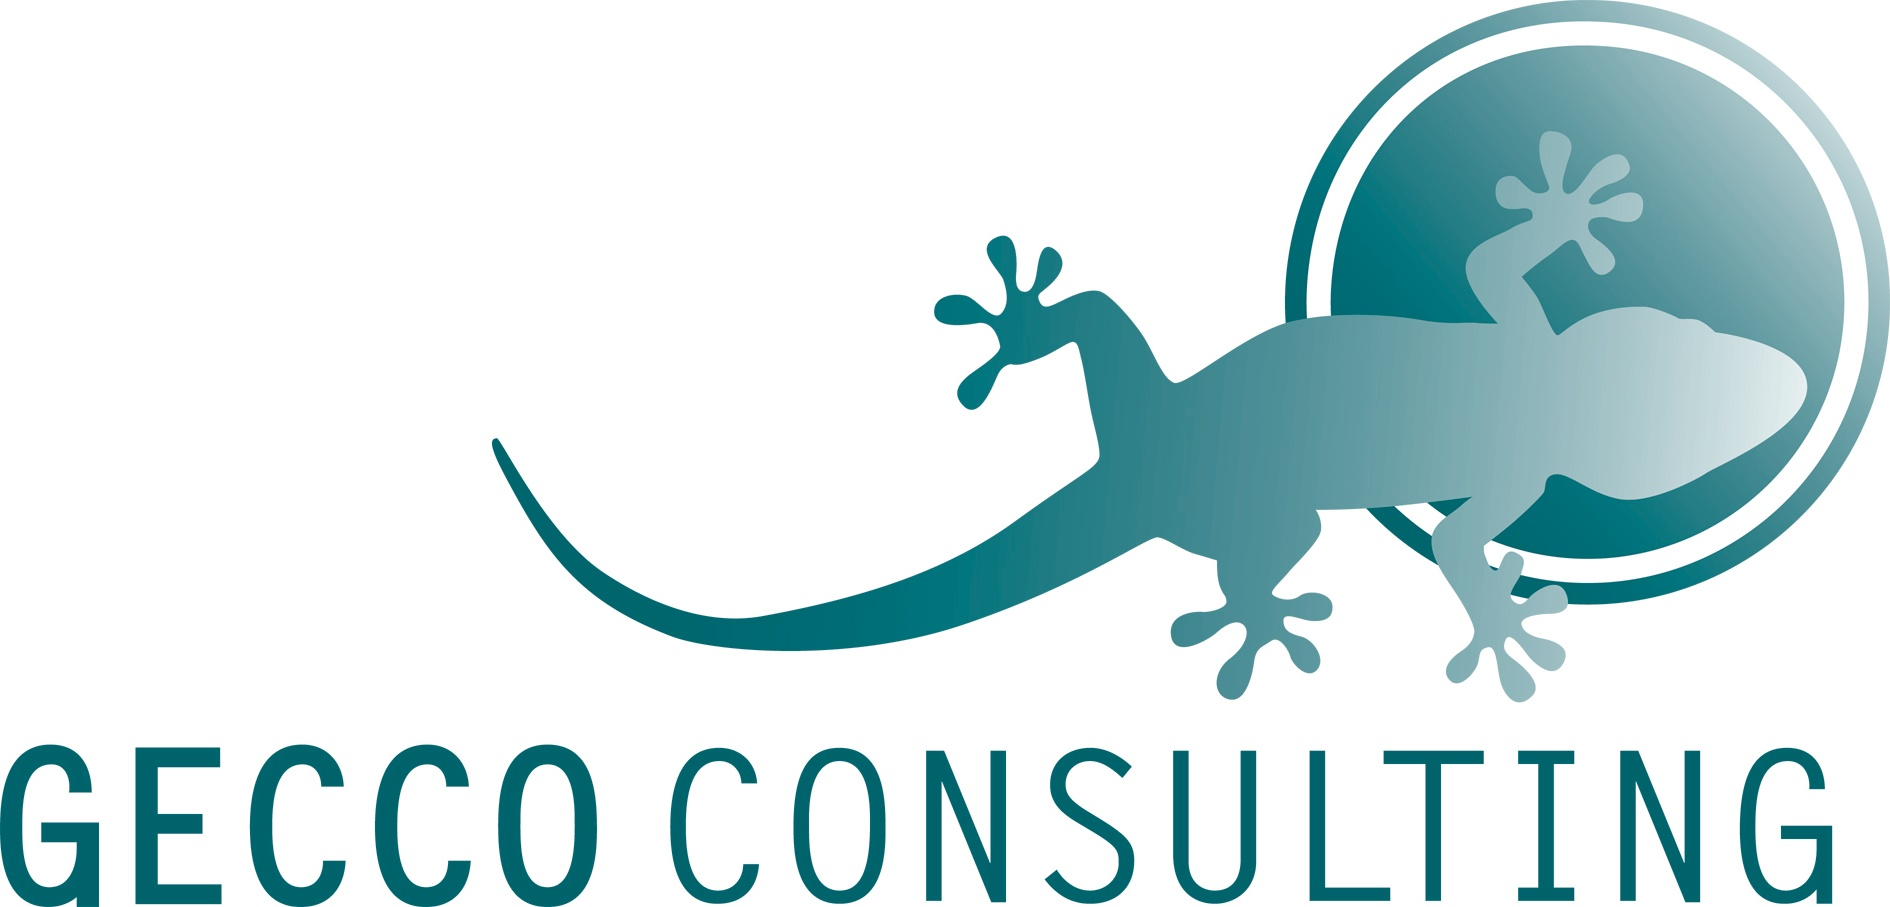 Gecco_Logo_Bild_Schriftmarke_quer_186KB